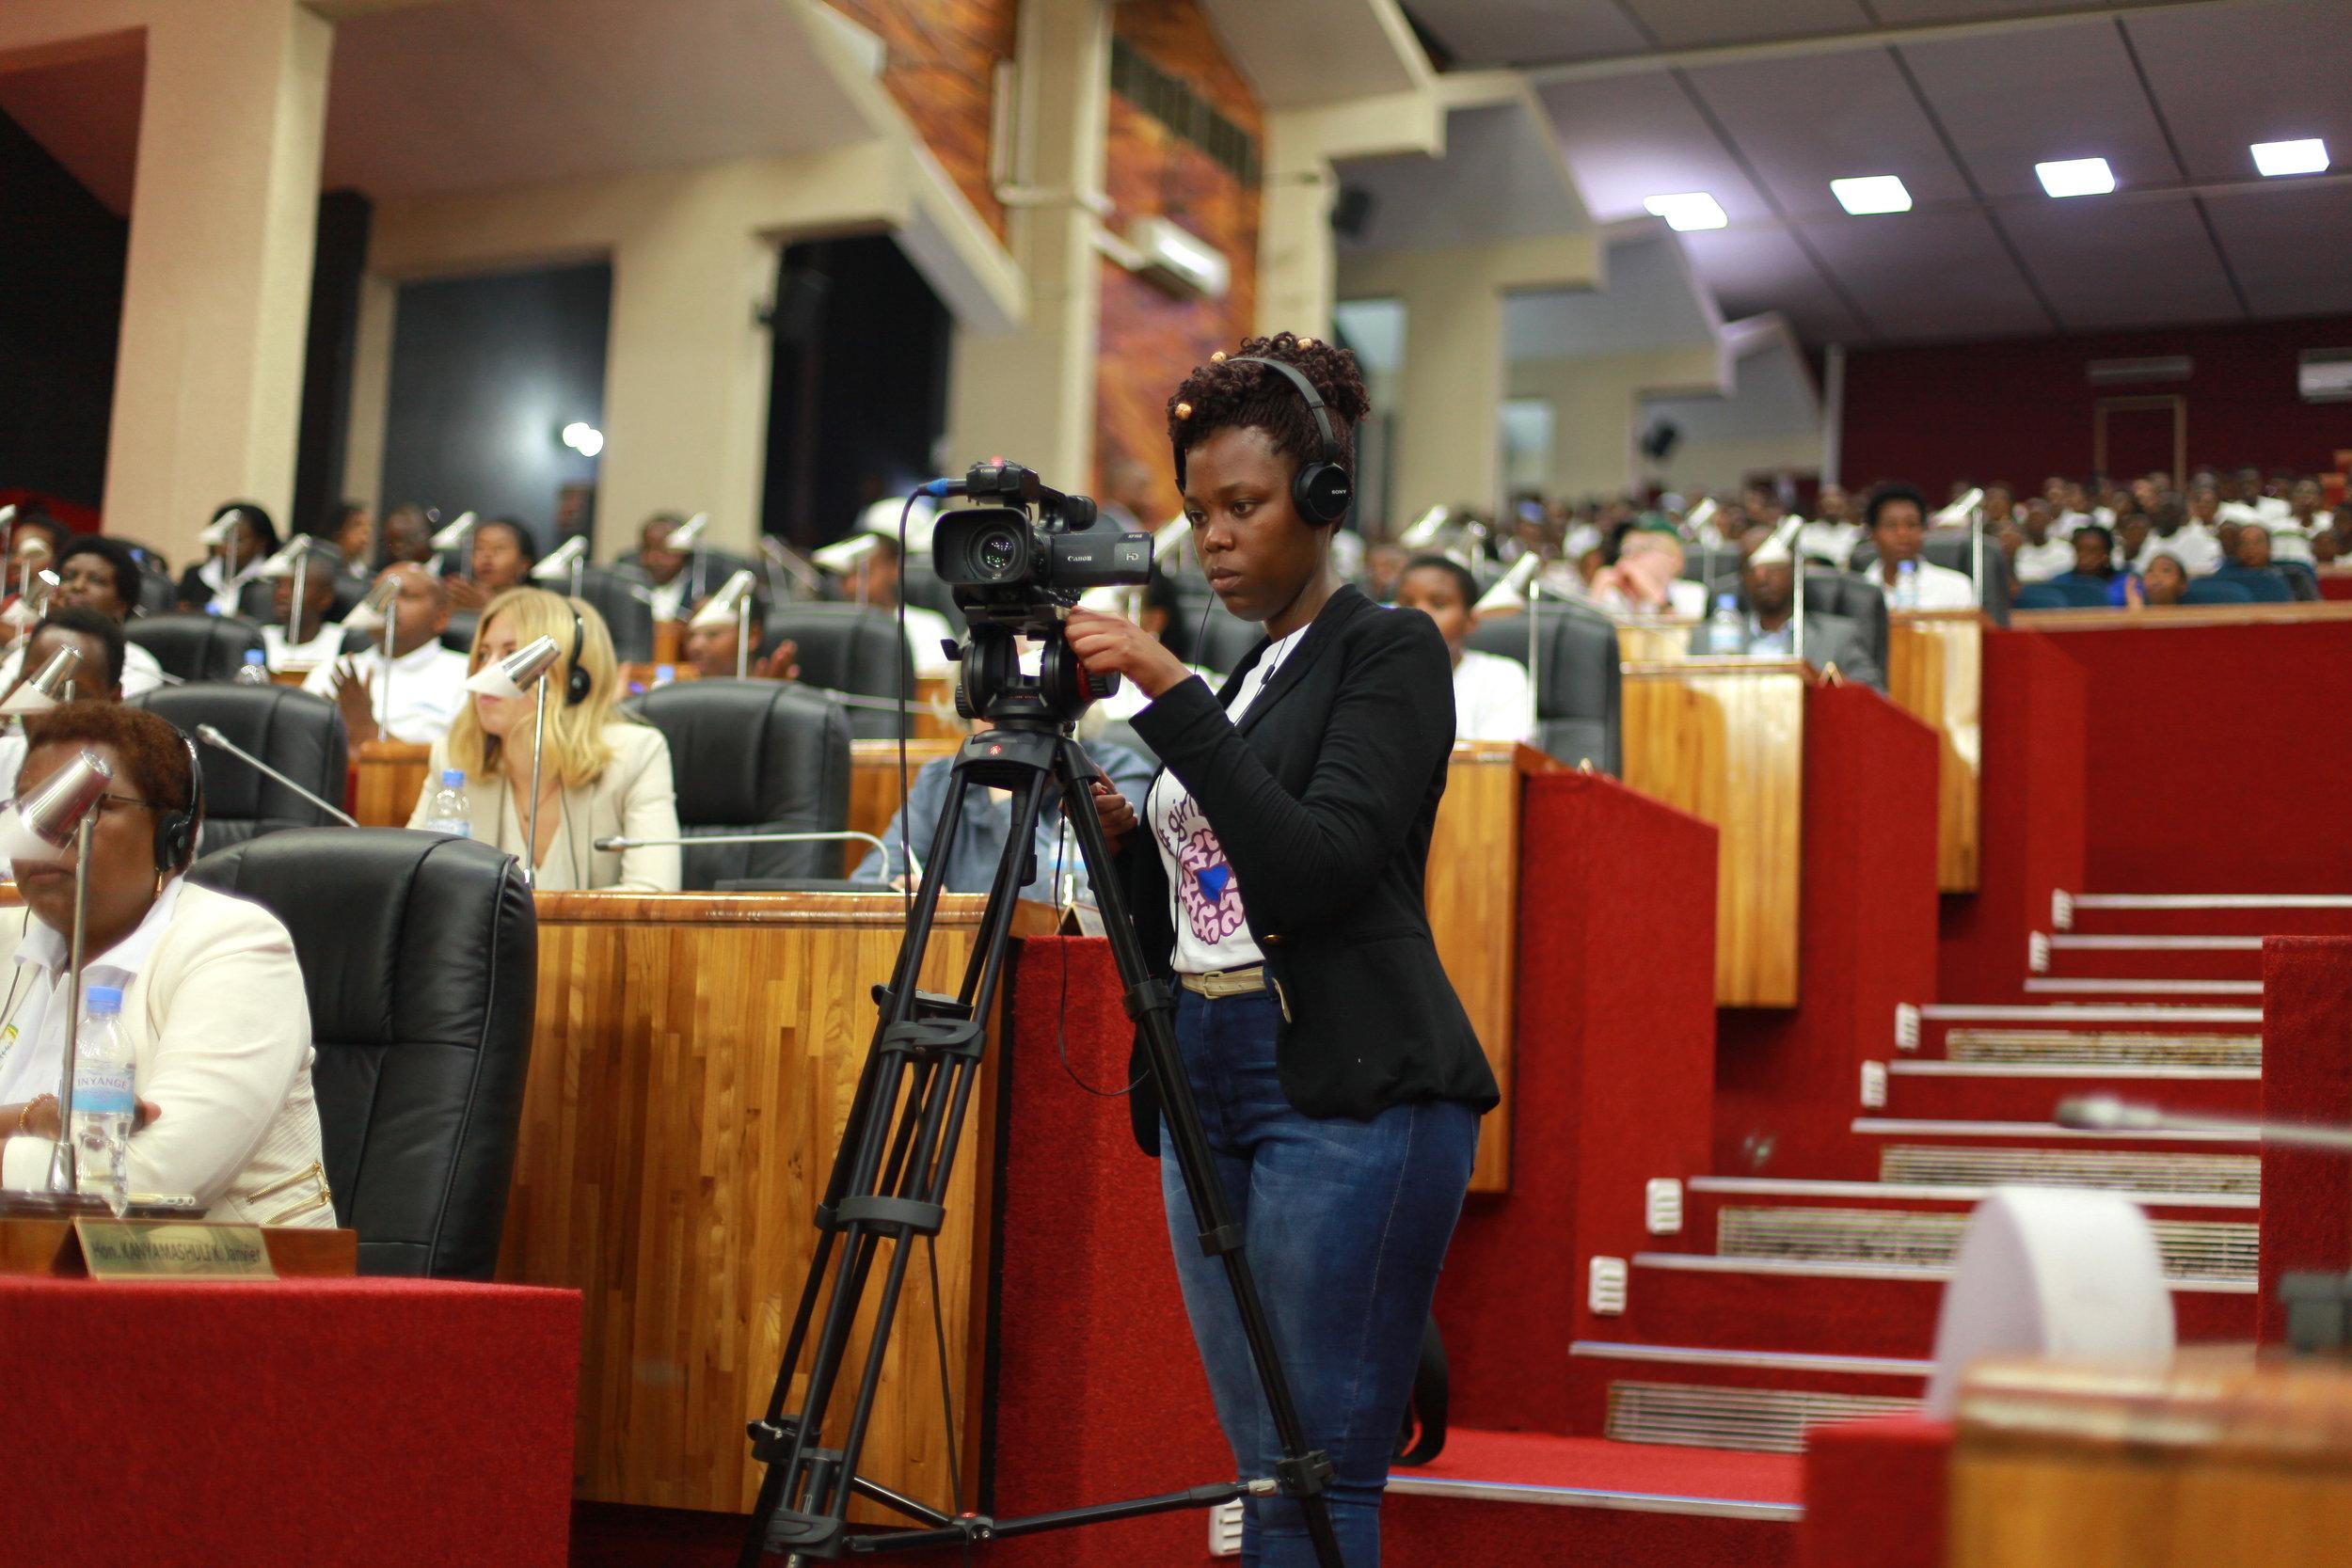 ADMA student Sandrine on an XF105, capturing video footage closeups of speakers on the main stage.